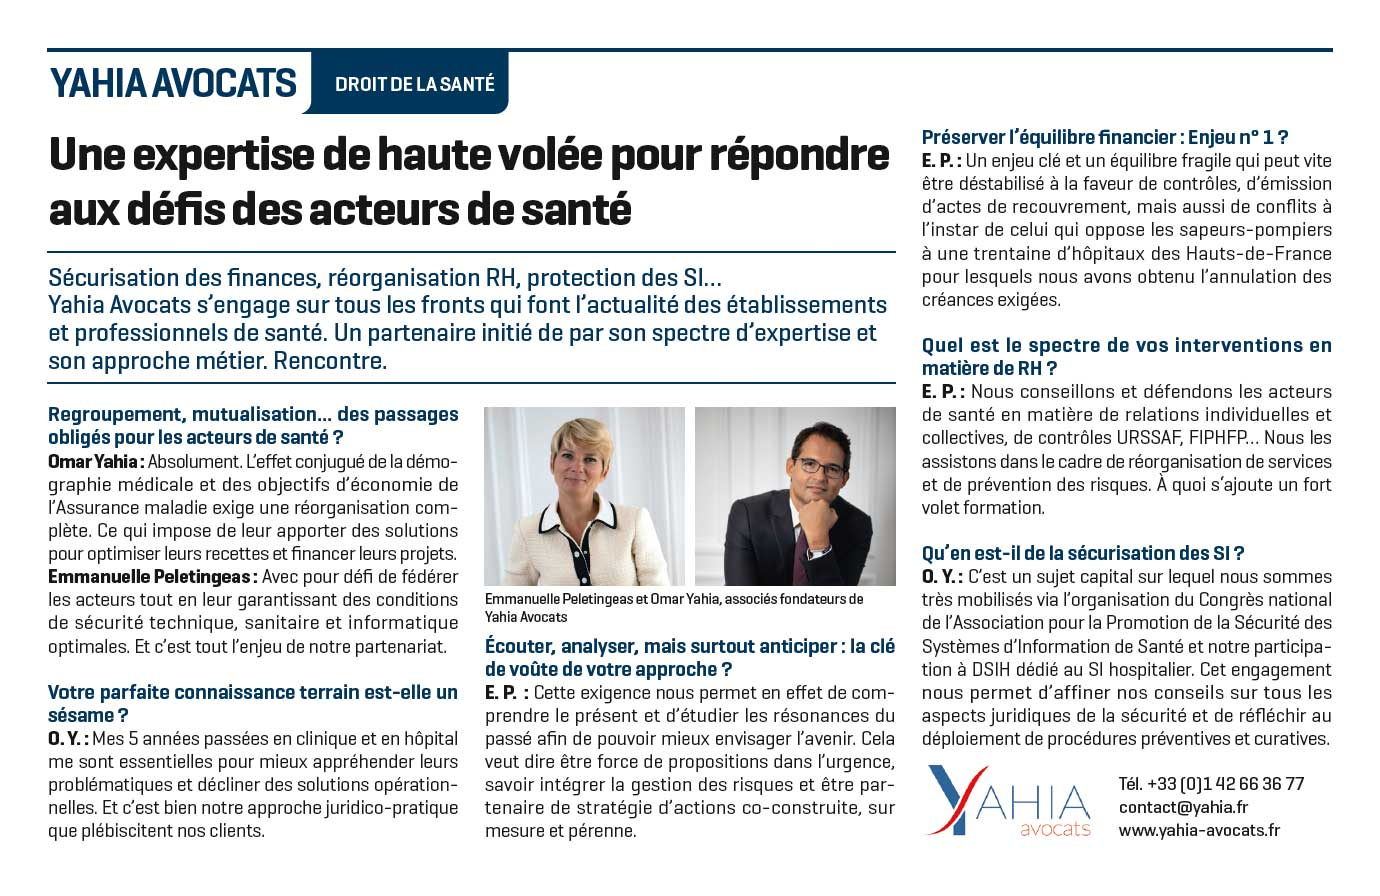 Le Figaro - Interview du cabinet Yahia Avocats - 9 juin 2021